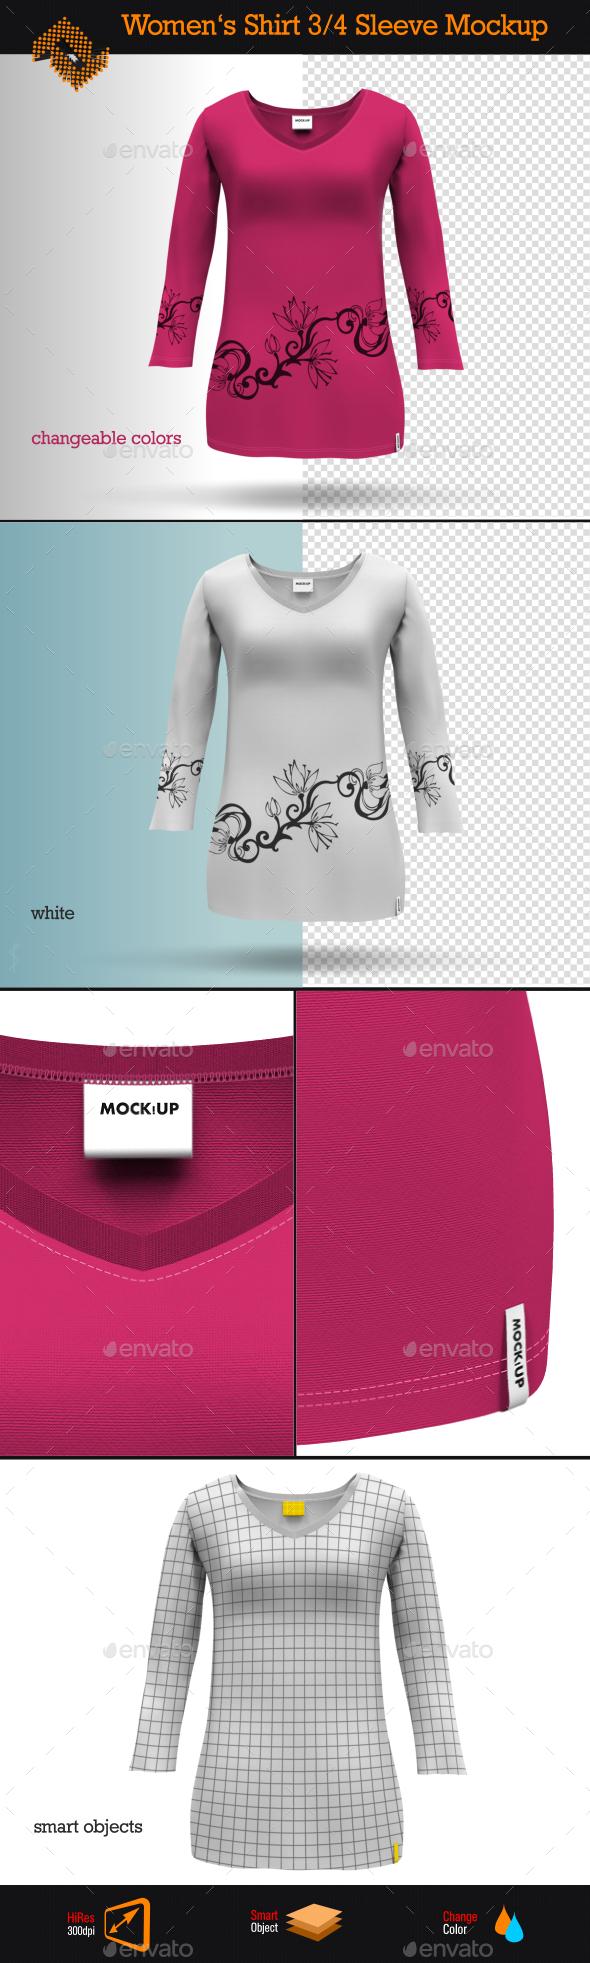 Womens 3/4 Sleeve Shirt Mockup - Apparel Product Mock-Ups